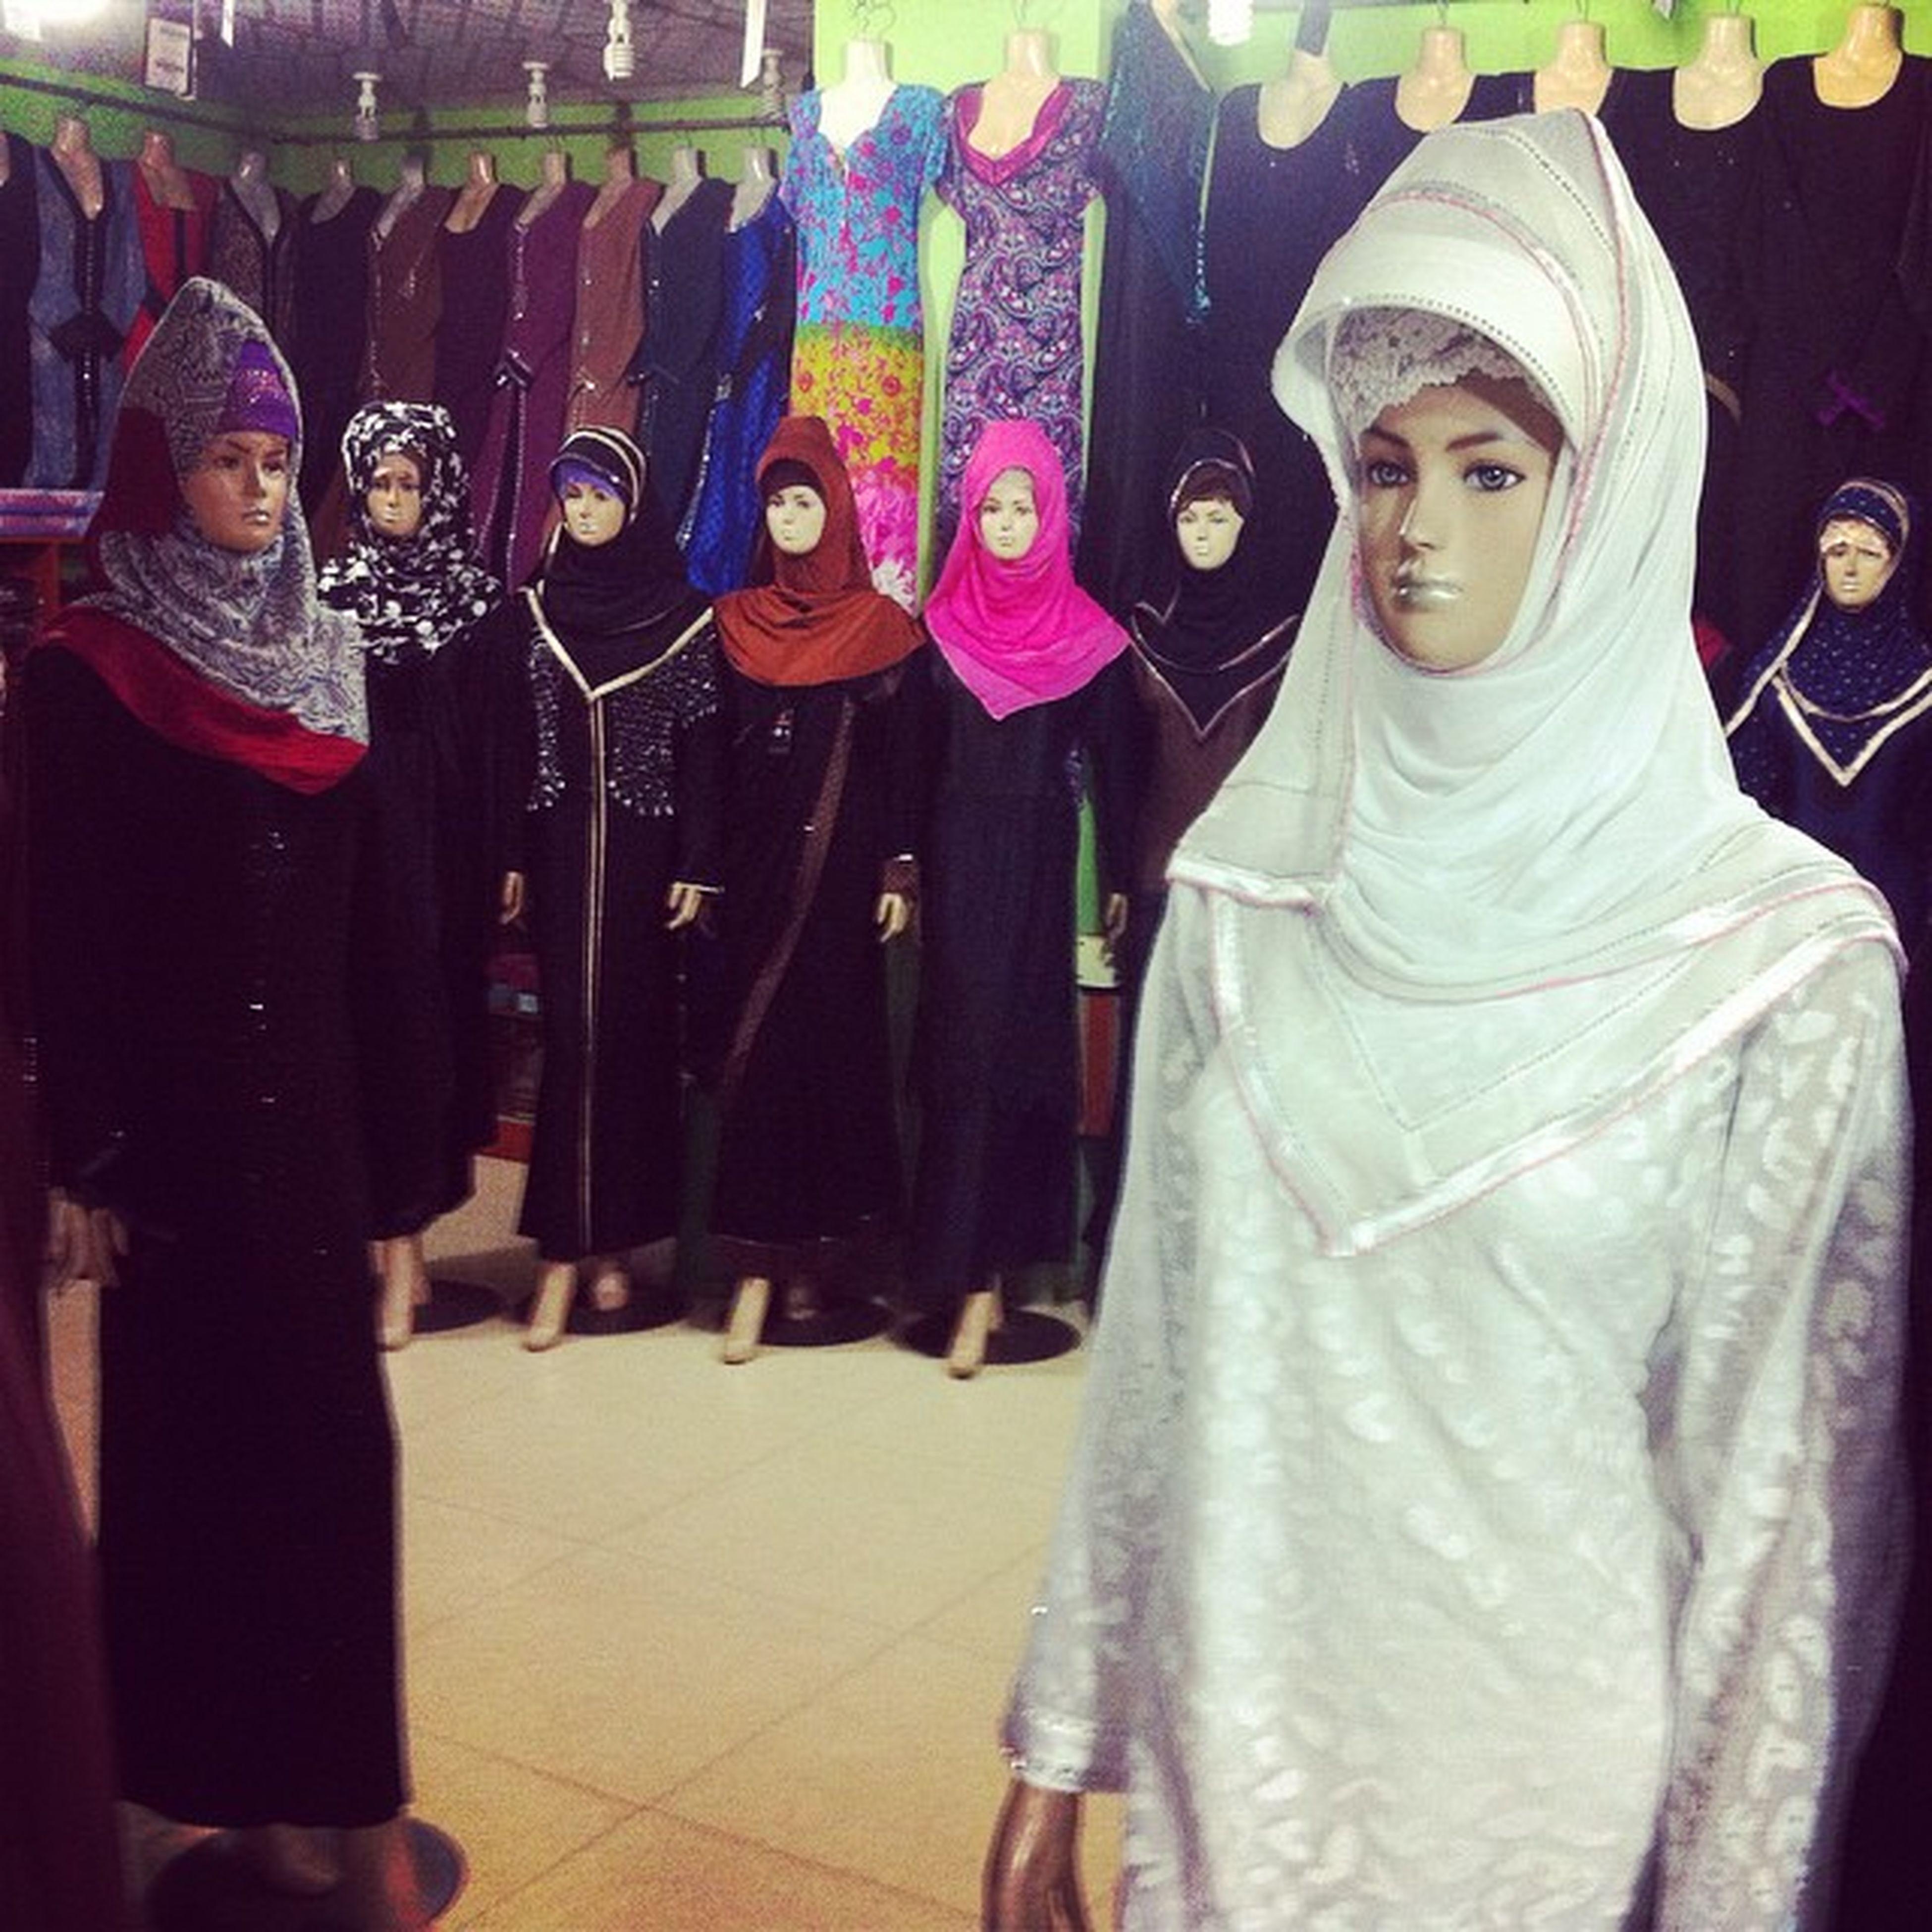 Hijab on display at shopping mall in Chittagong. Js Photographer Hijab Displlay Shoppingmall Mannequin IPhone Insta Photojournalism Documentary Opensociety Reportagespotlight Chittagong Bangladesh Chottogram Instagram Everydaybangladesh